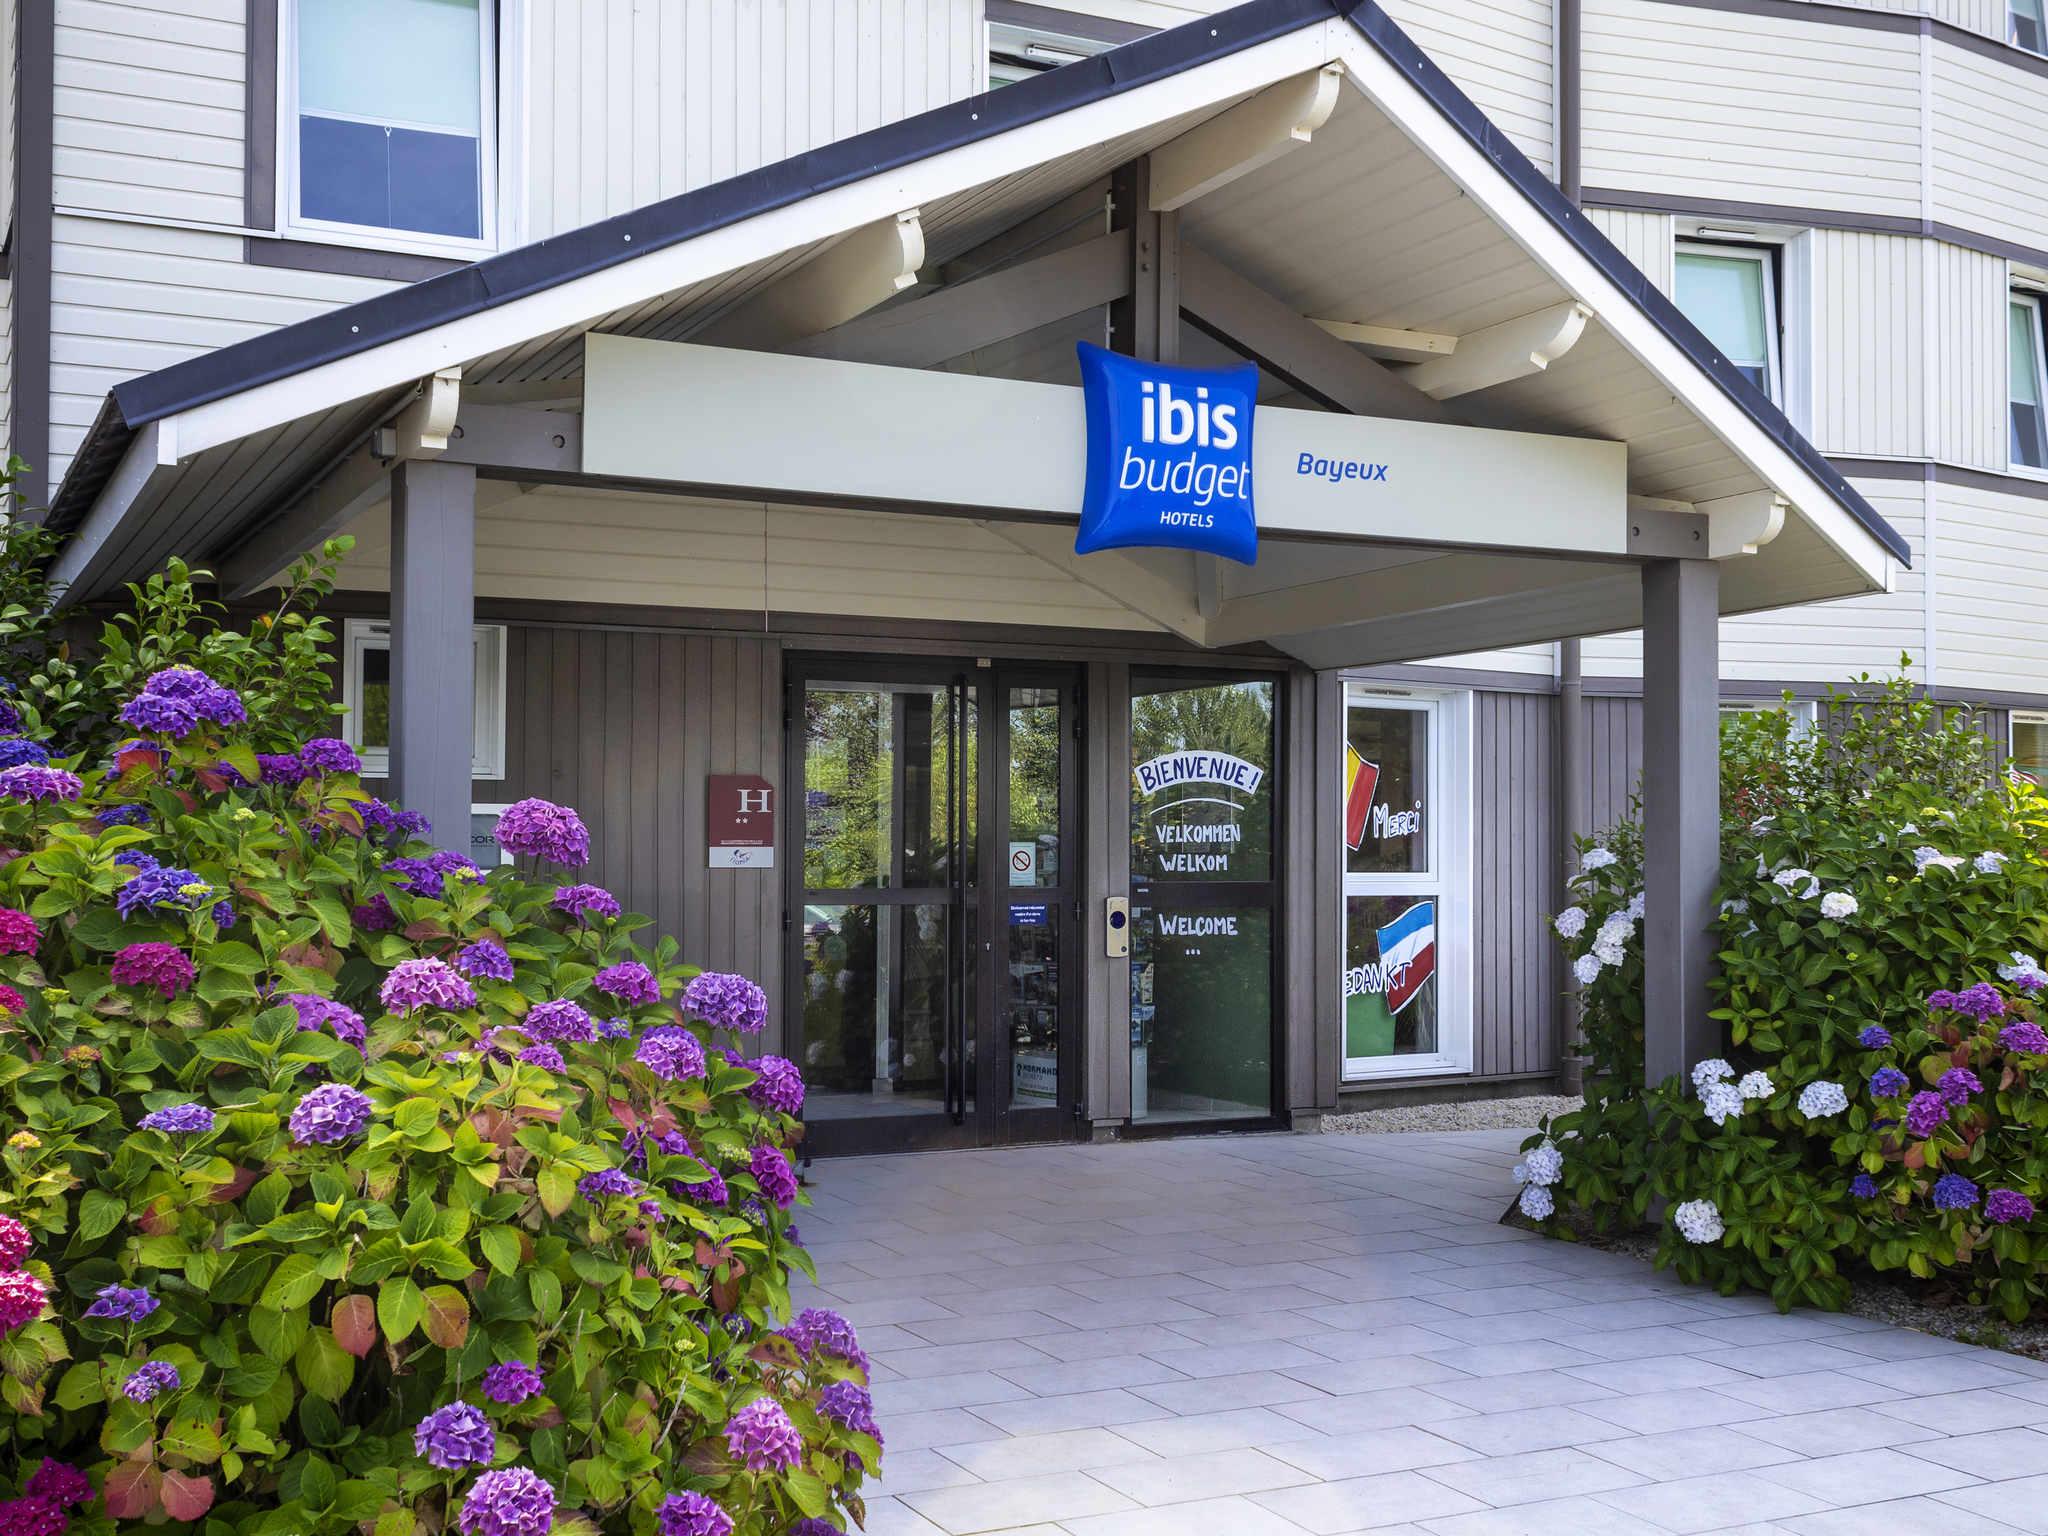 Отель — ibis budget Bayeux